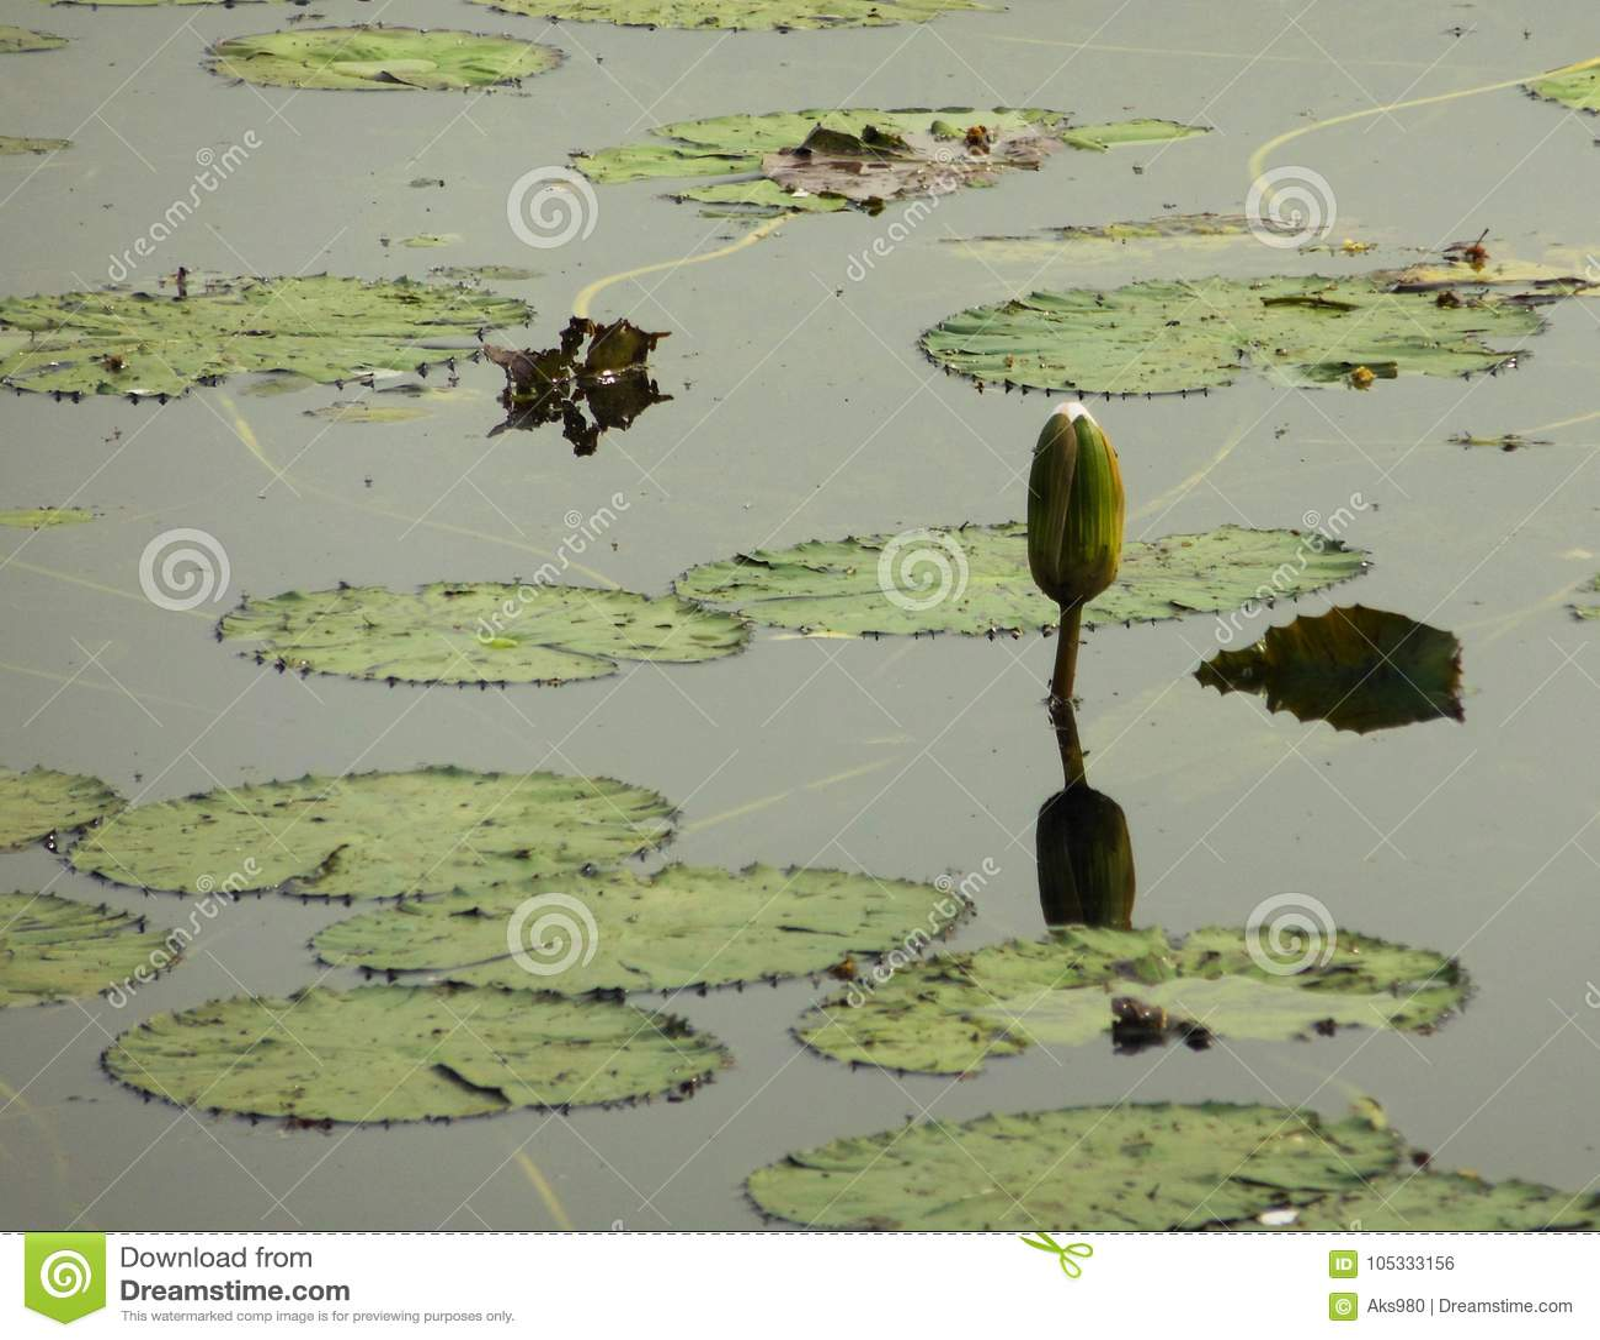 Lotus flower water lily bud in pond natural habitat stock photo download lotus flower water lily bud in pond natural habitat stock photo image of bloom mightylinksfo